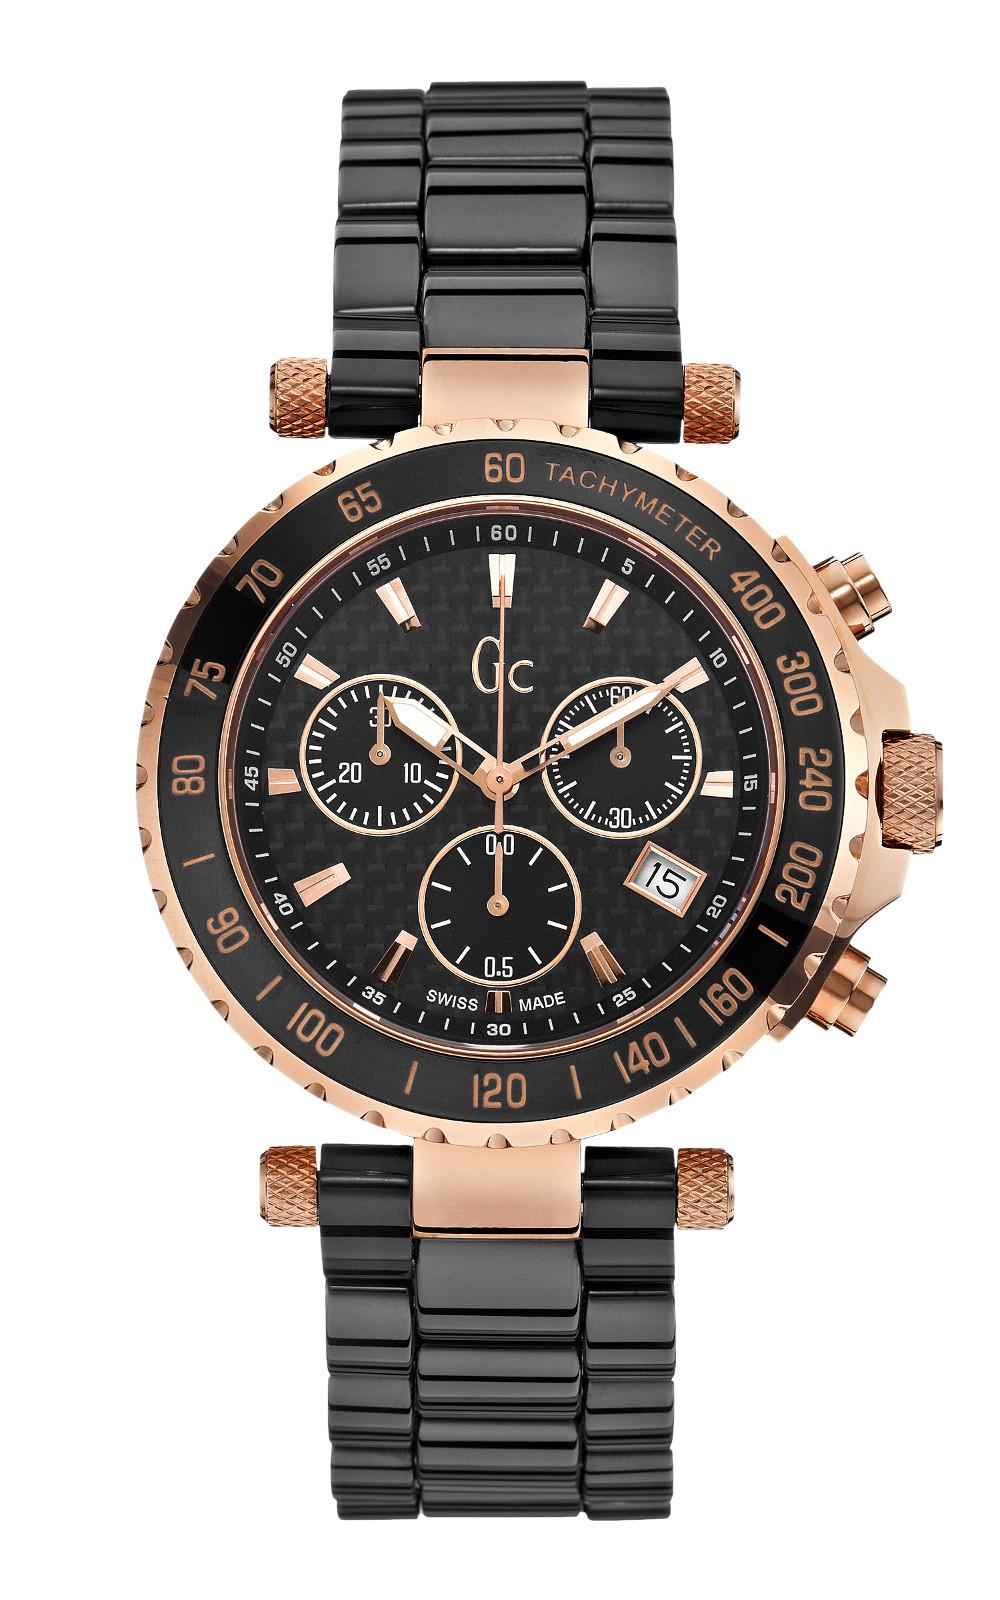 GC X58003G2S Γυναικείο Ρολόι Quartz Χρονογράφος Ακριβείας